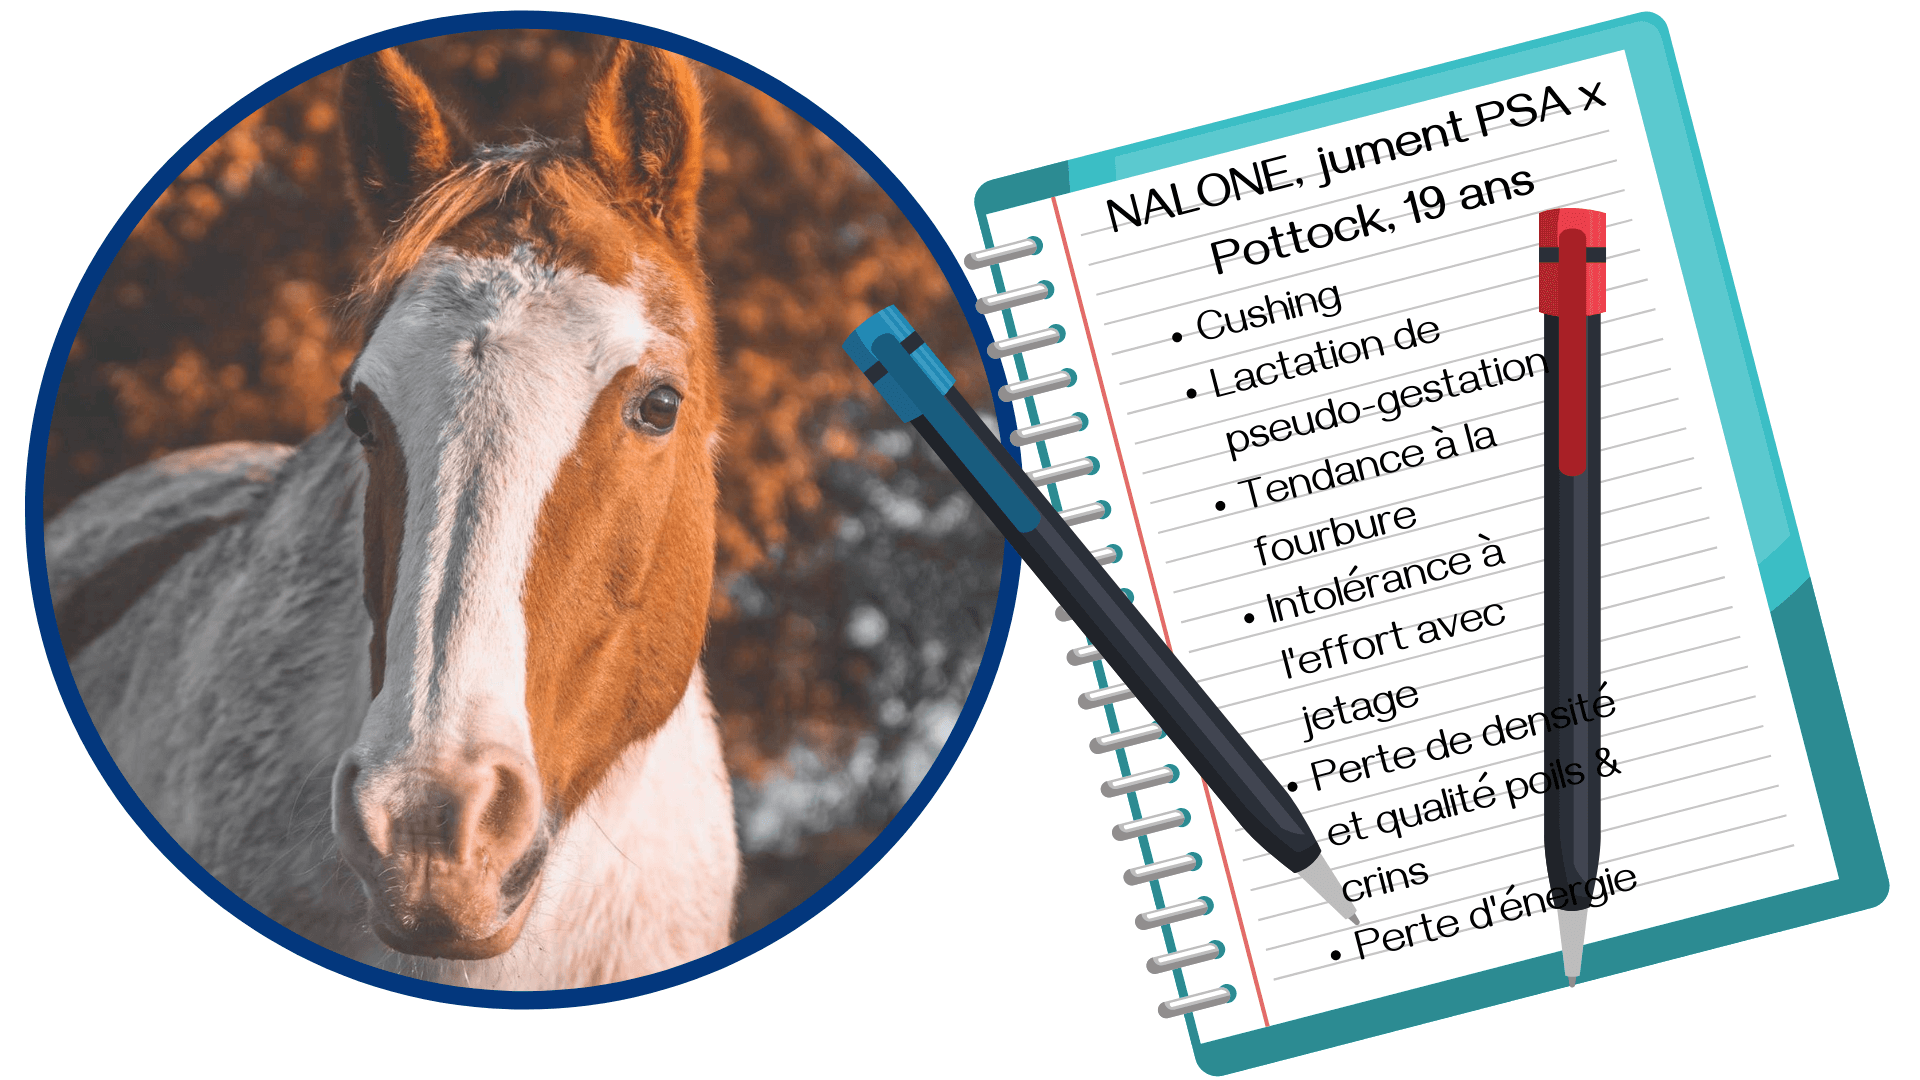 gemmothérapie naturopathie cheval cushing fourbure lactation pseudo-gestation grossesse nerveuse praescend soin naturel médecine douce alternative